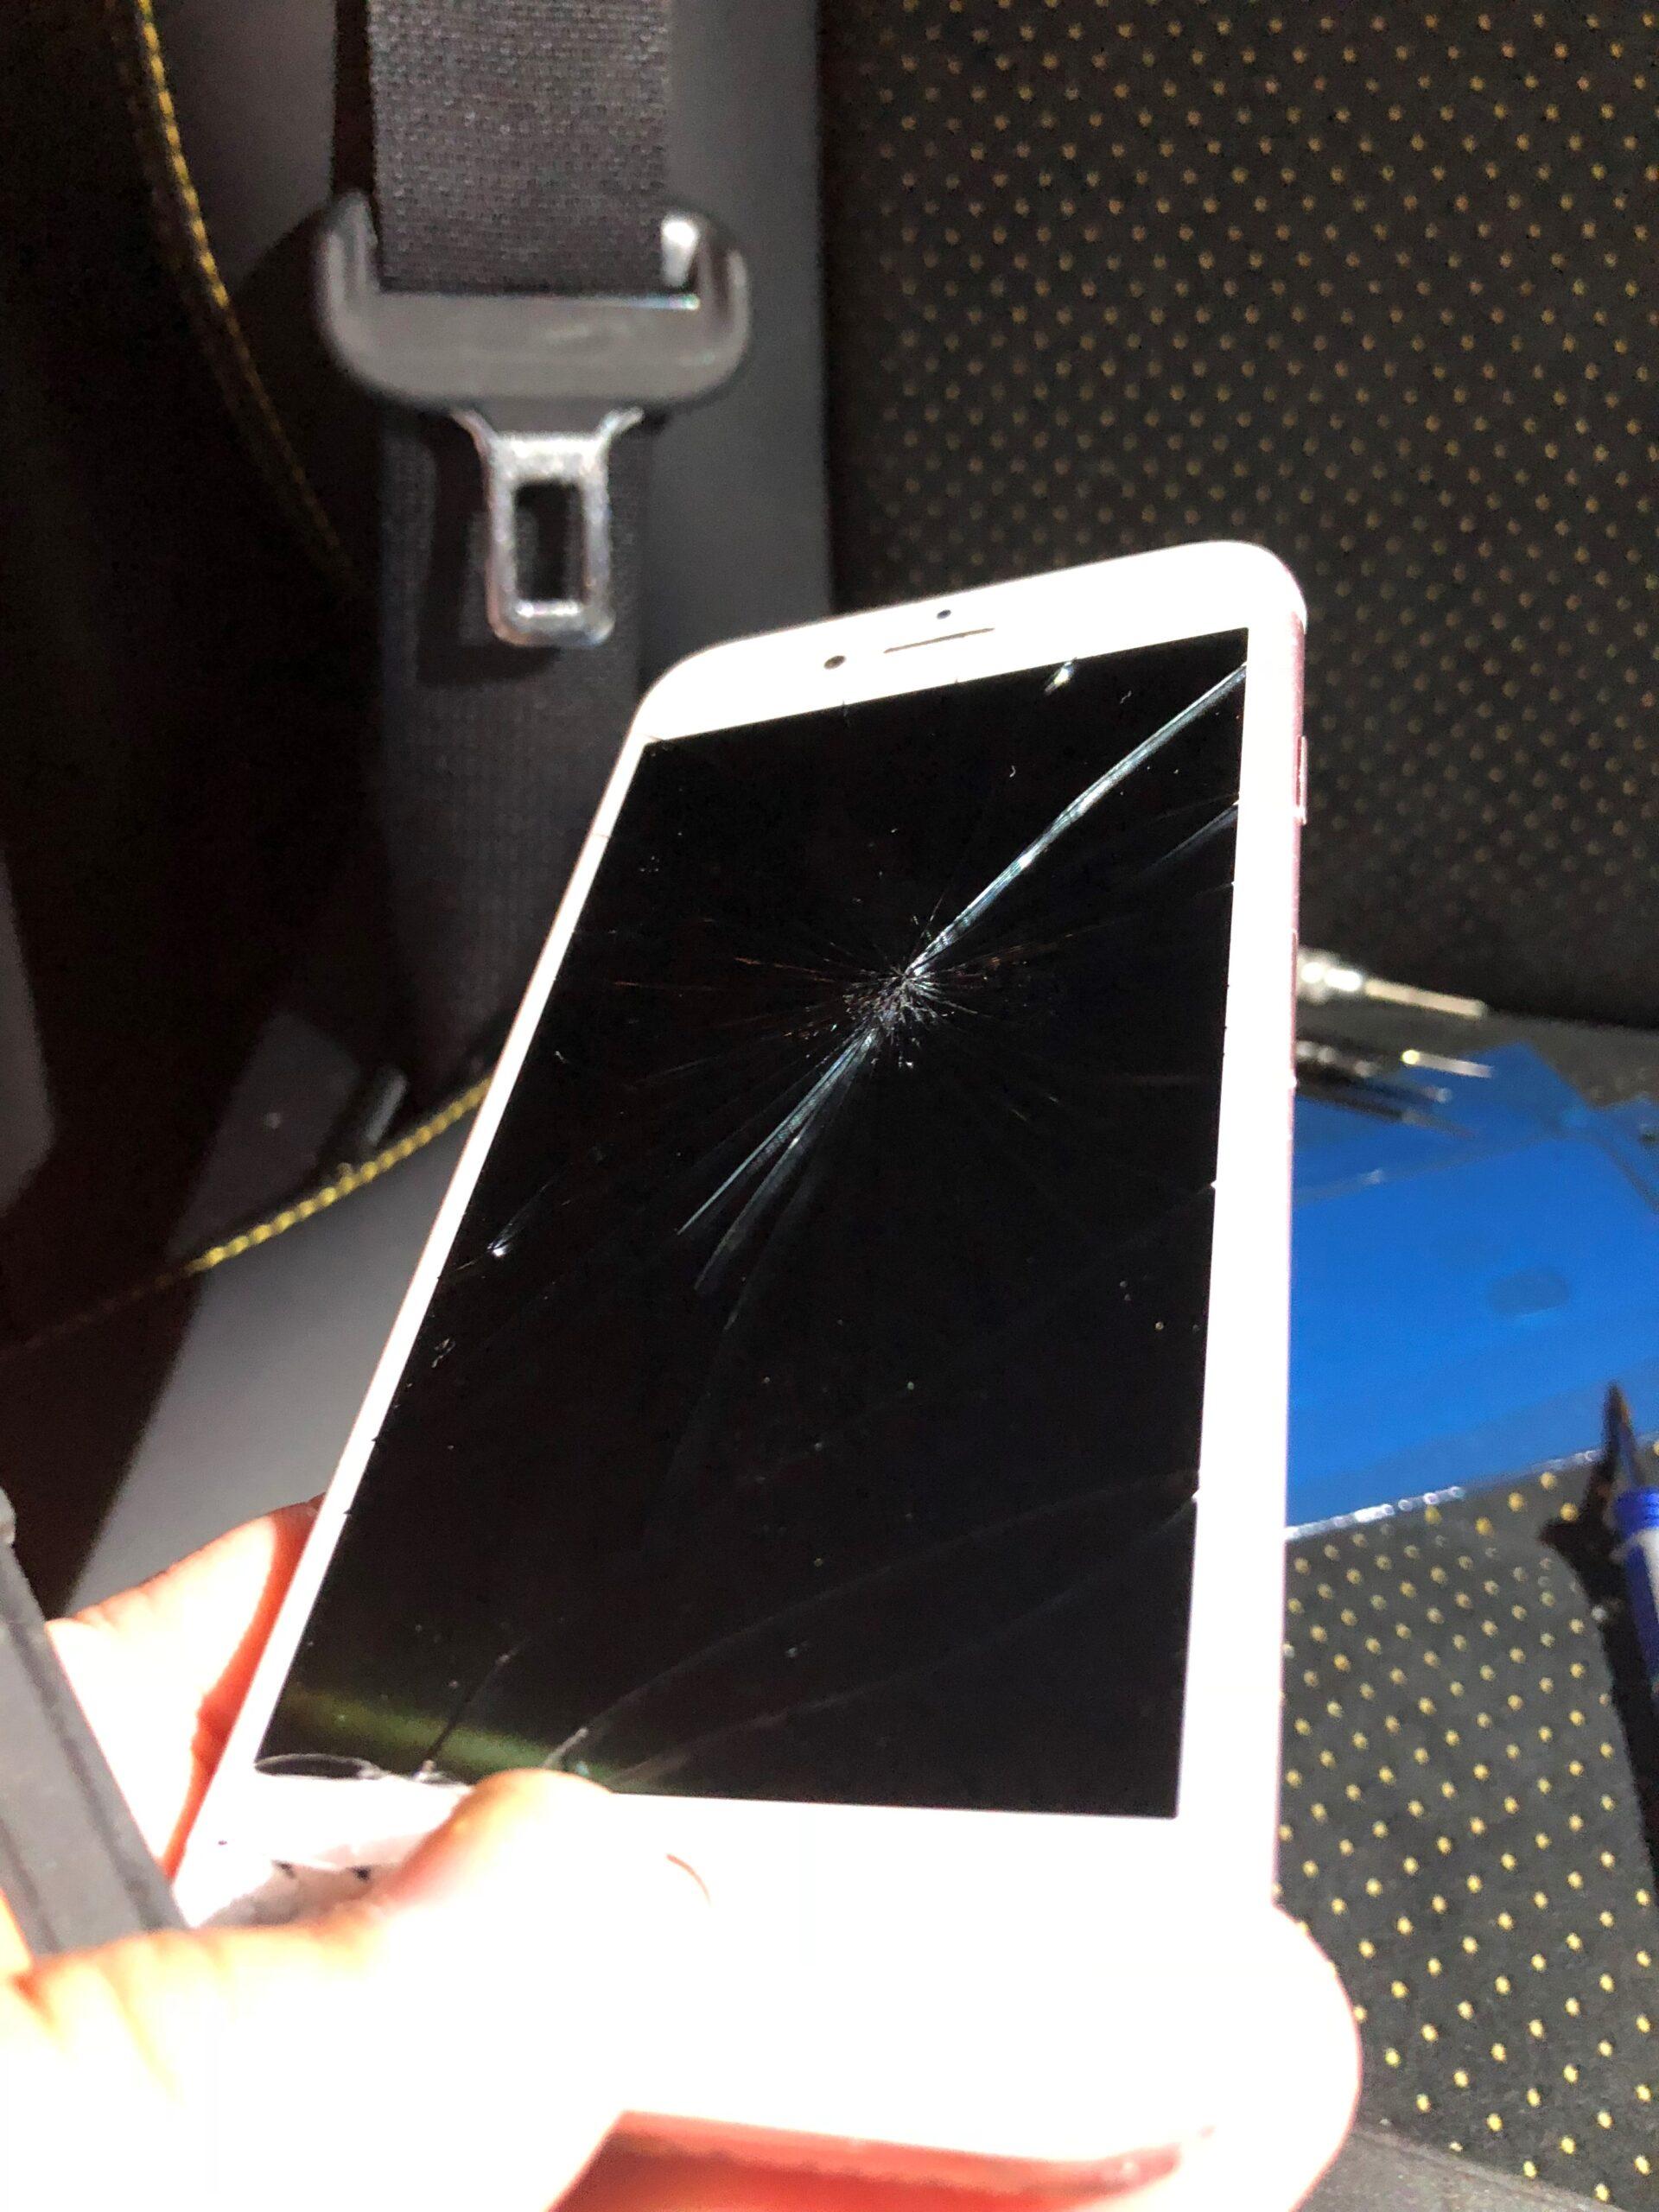 iphoneドクター立川店出張修理 iphone7液晶交換